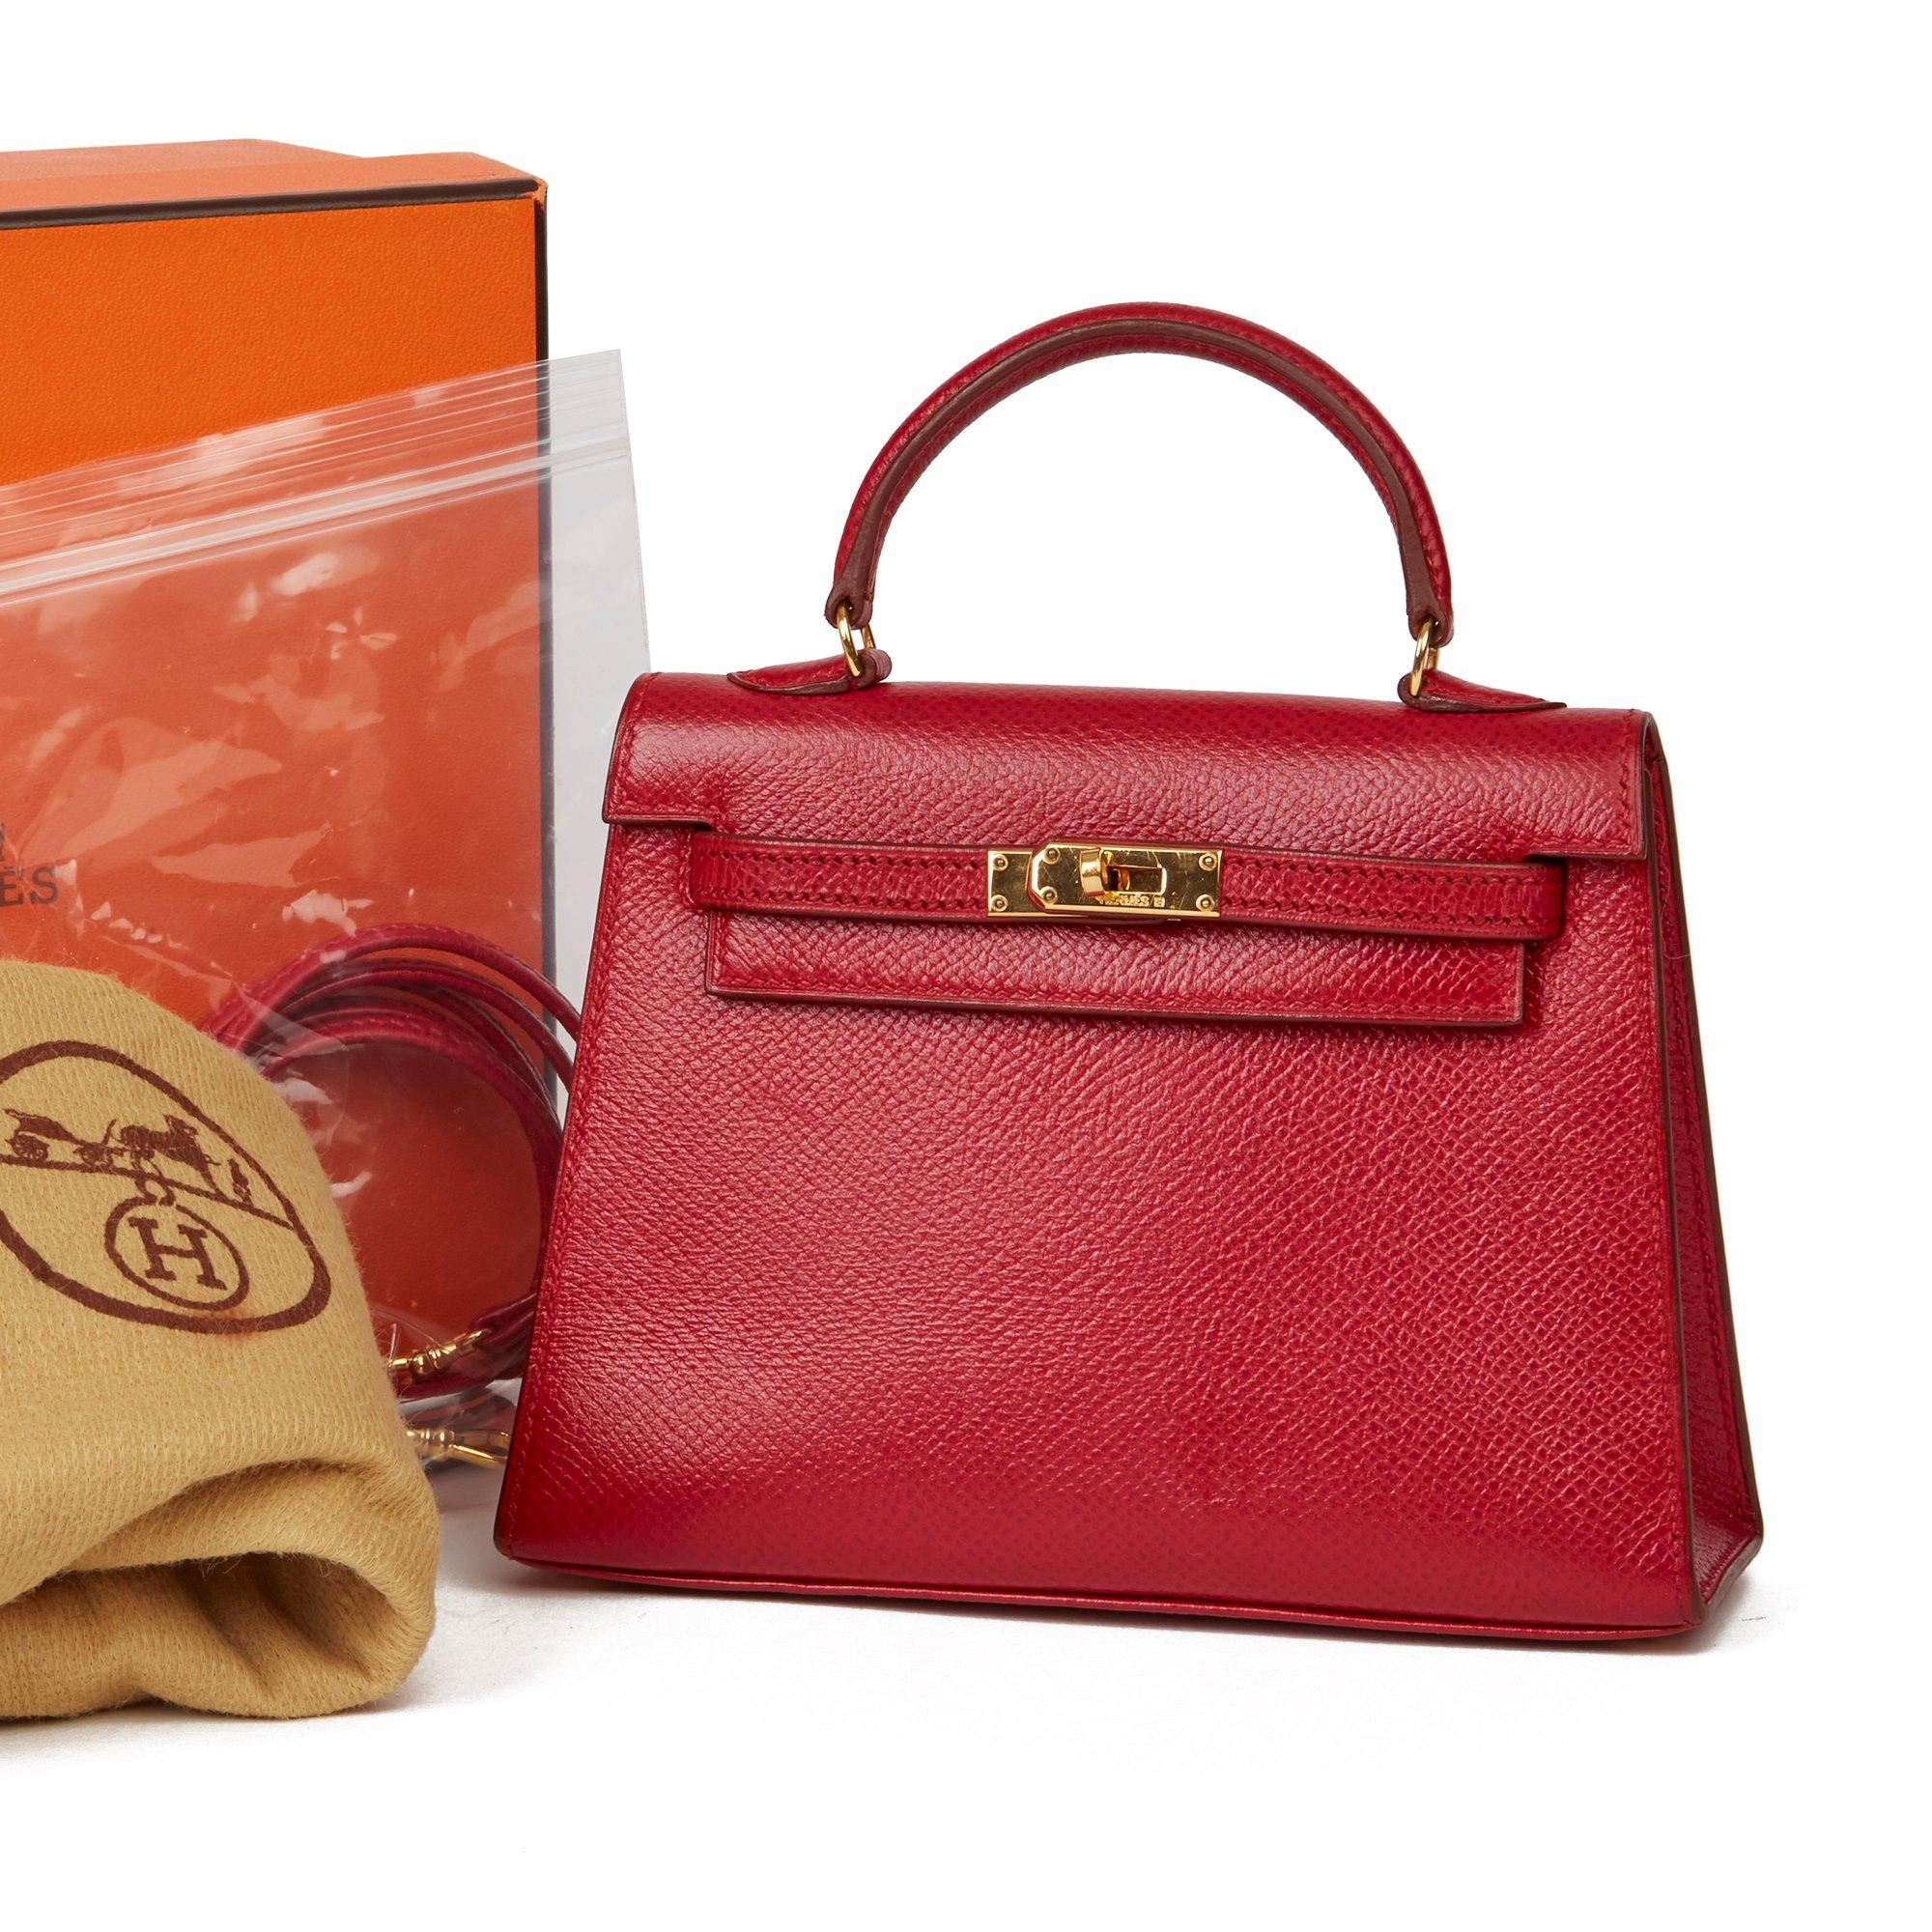 Hermès Rouge Vif Courchevel Leather Vintage Kelly 15cm Sellier